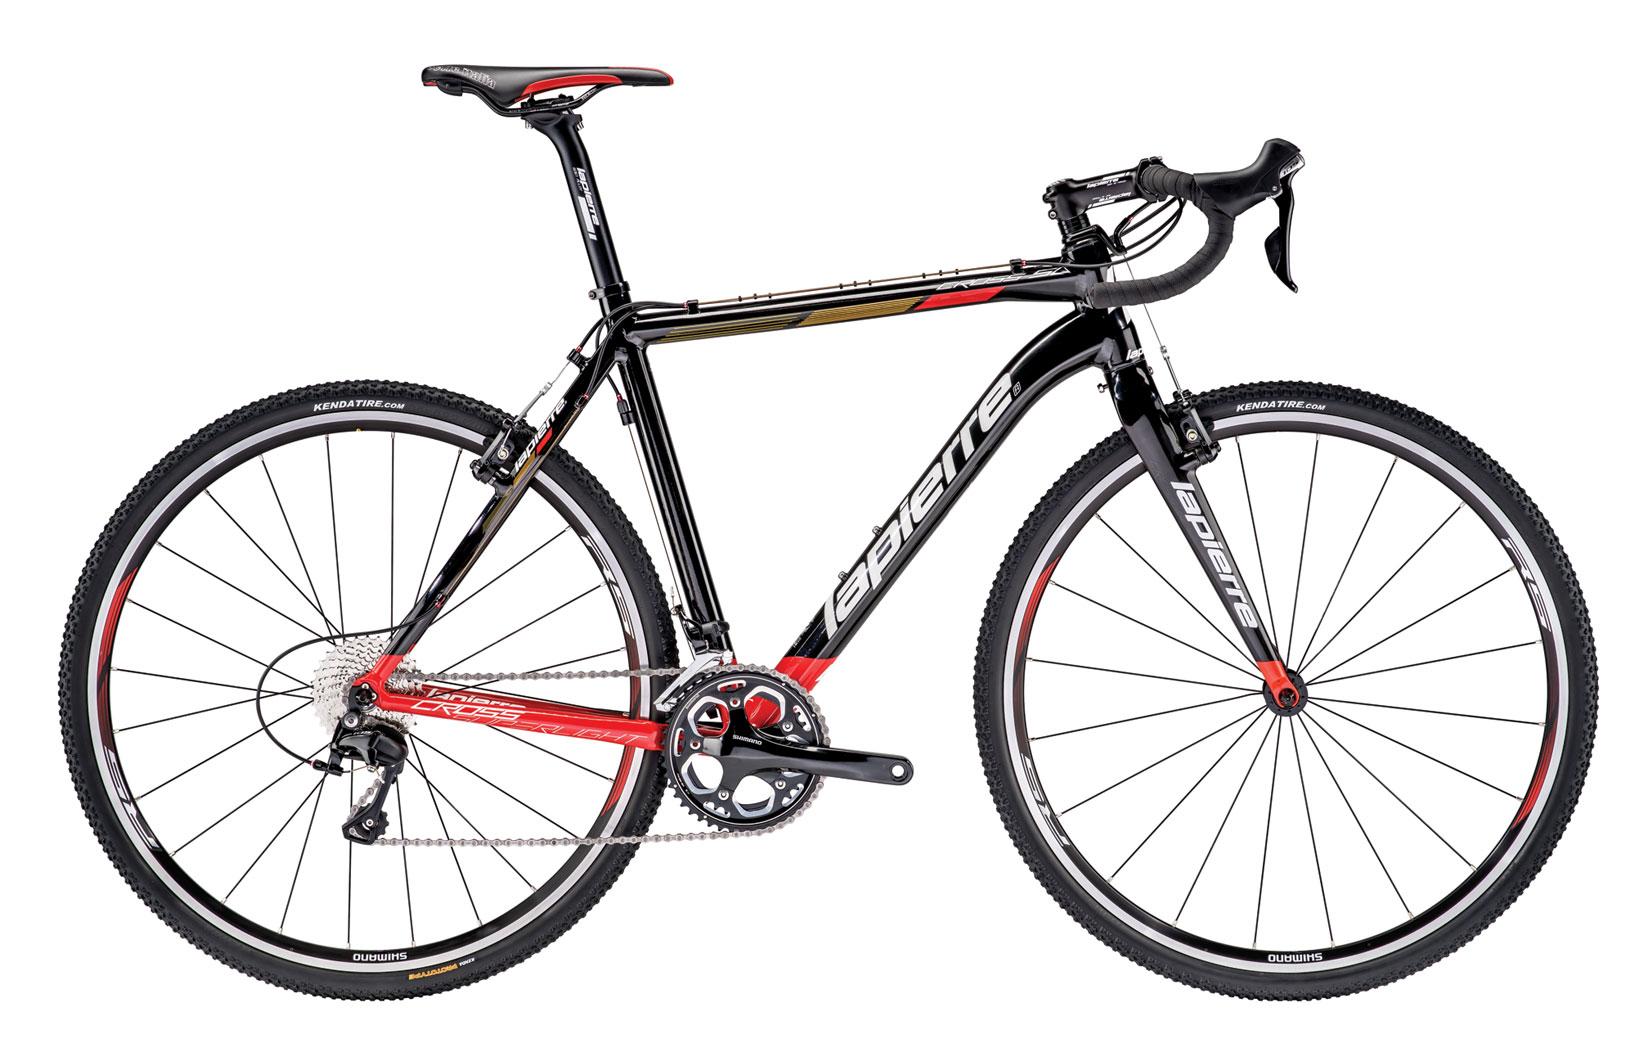 Lapierre Cyclo Cross Cx 500 Aluminyum